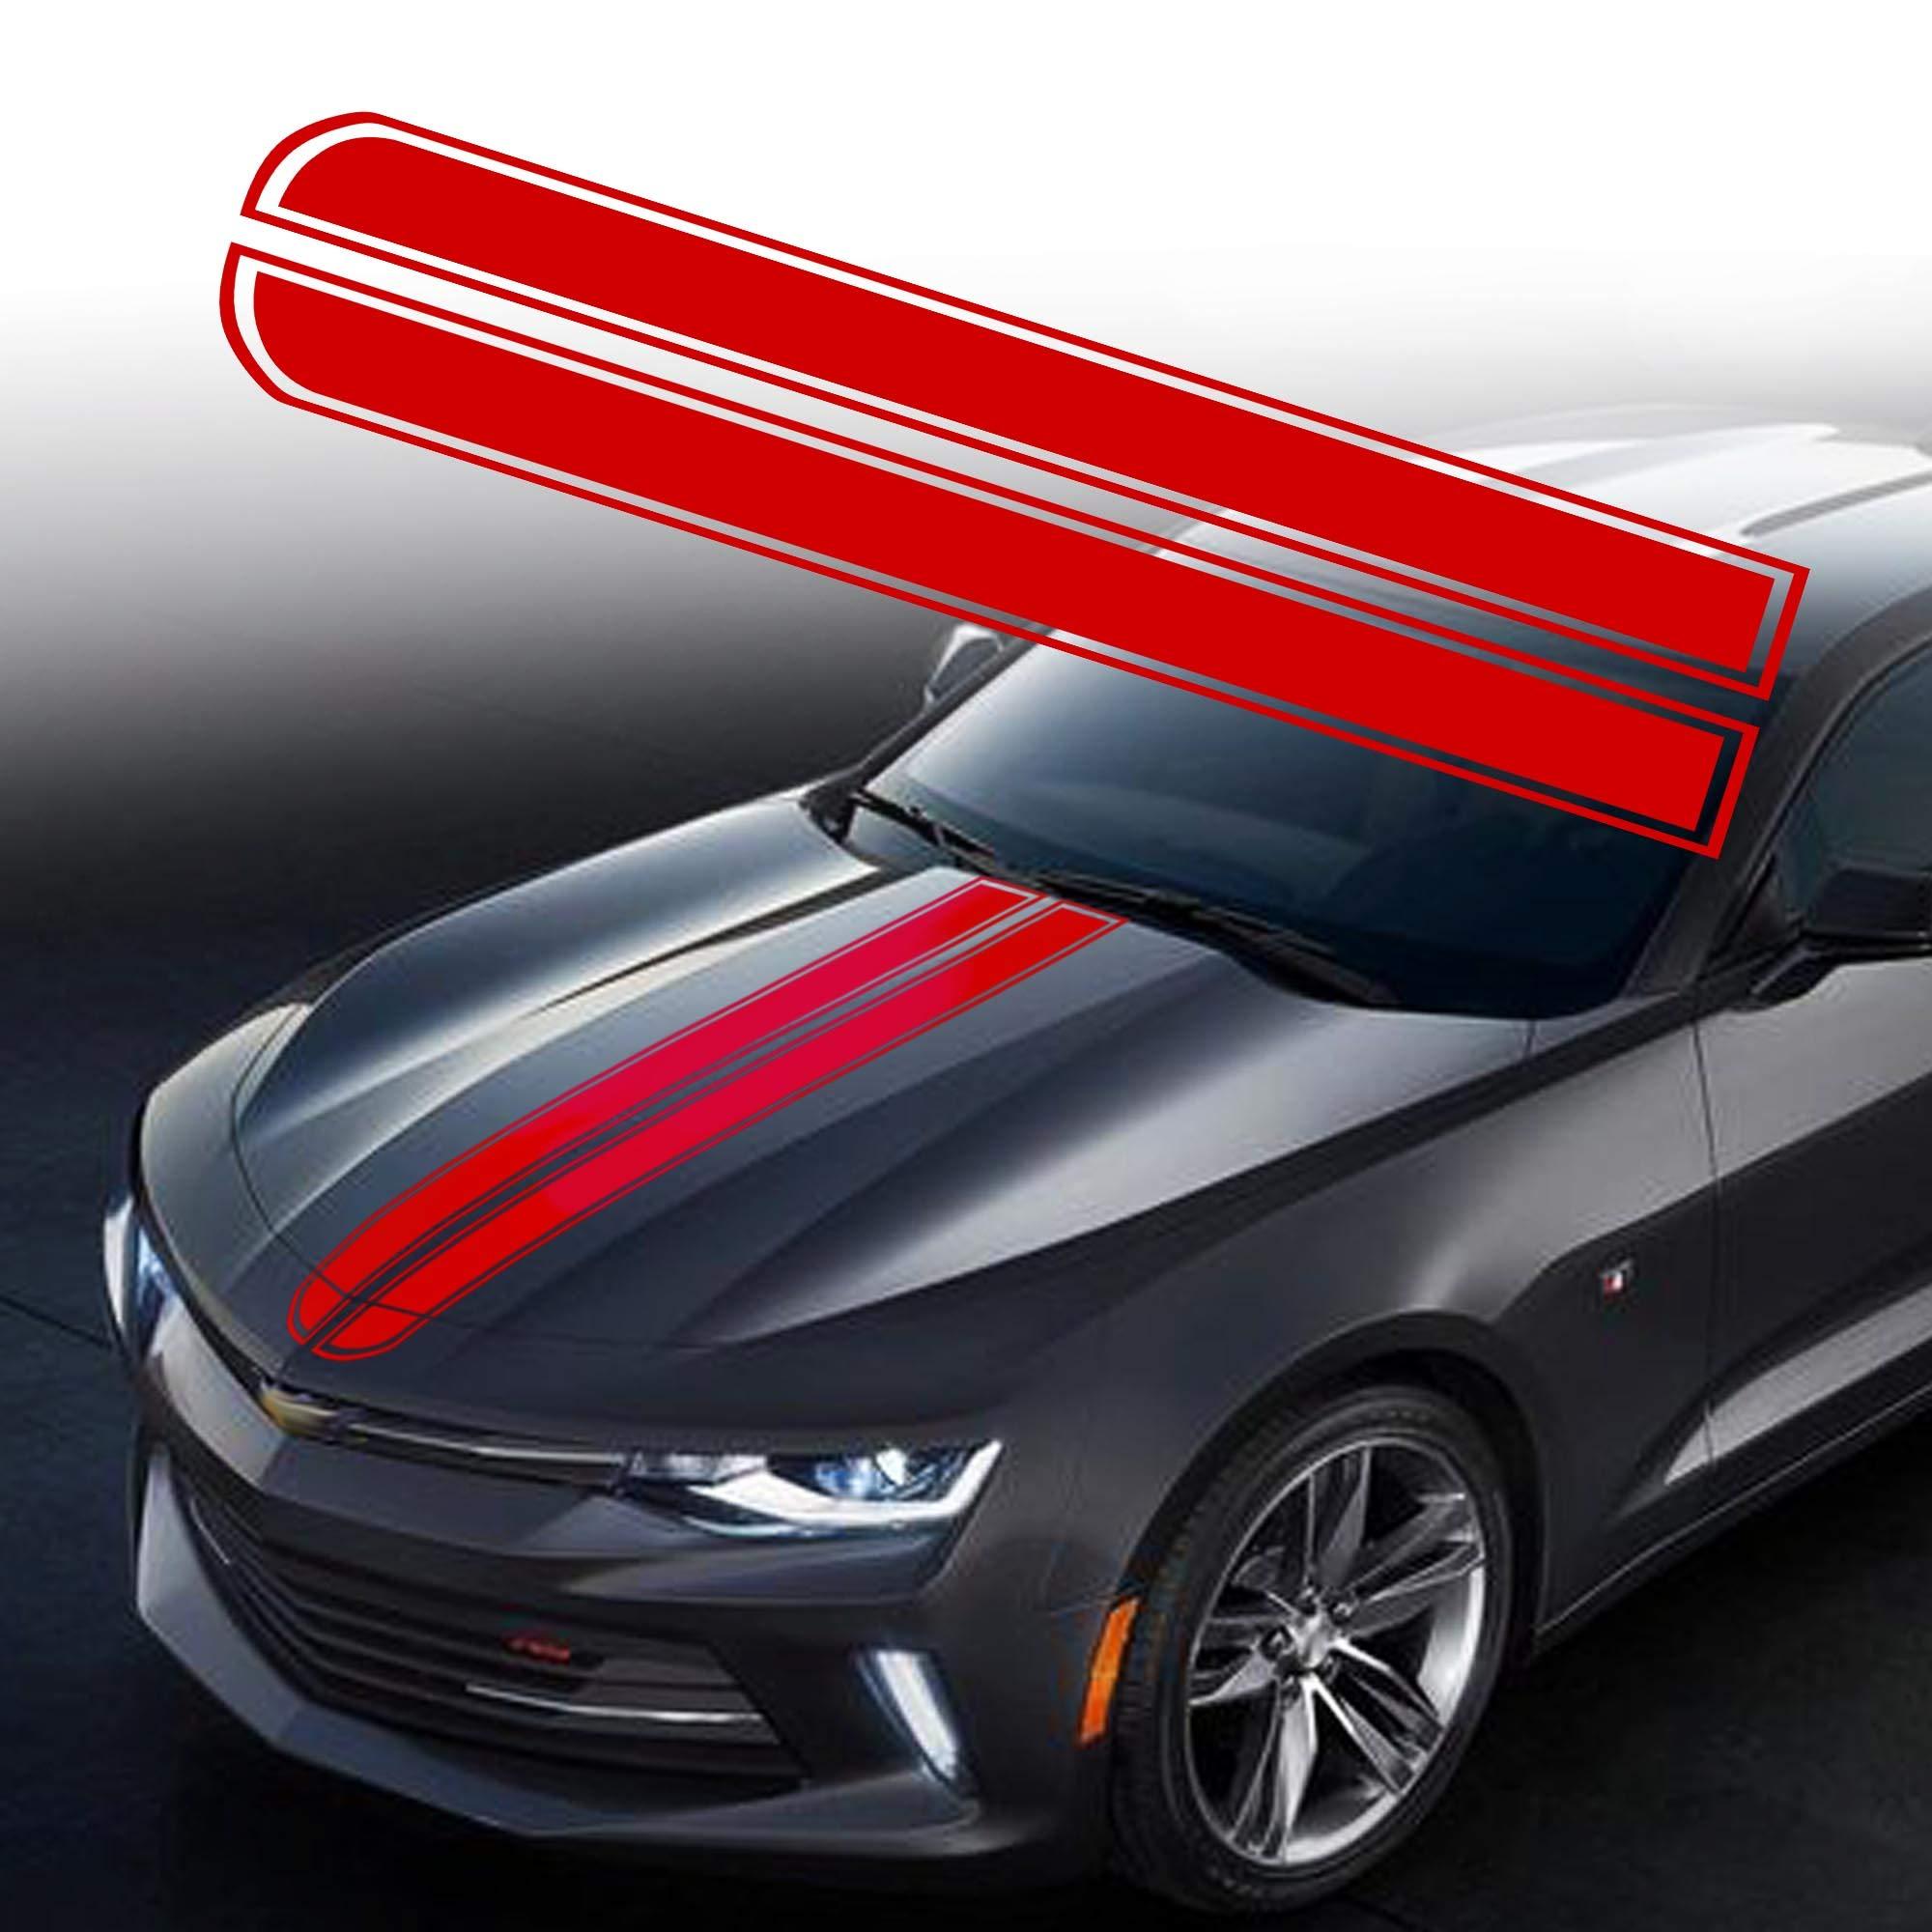 TOMALL 50.8x 9.5 Car Hood Stripe Sticker Auto Racing Body Side Stripe Decal Skirt Roof Hood Bumper Stripe Decal Vinyl Modified Stripe Decal Decoration for Car Red